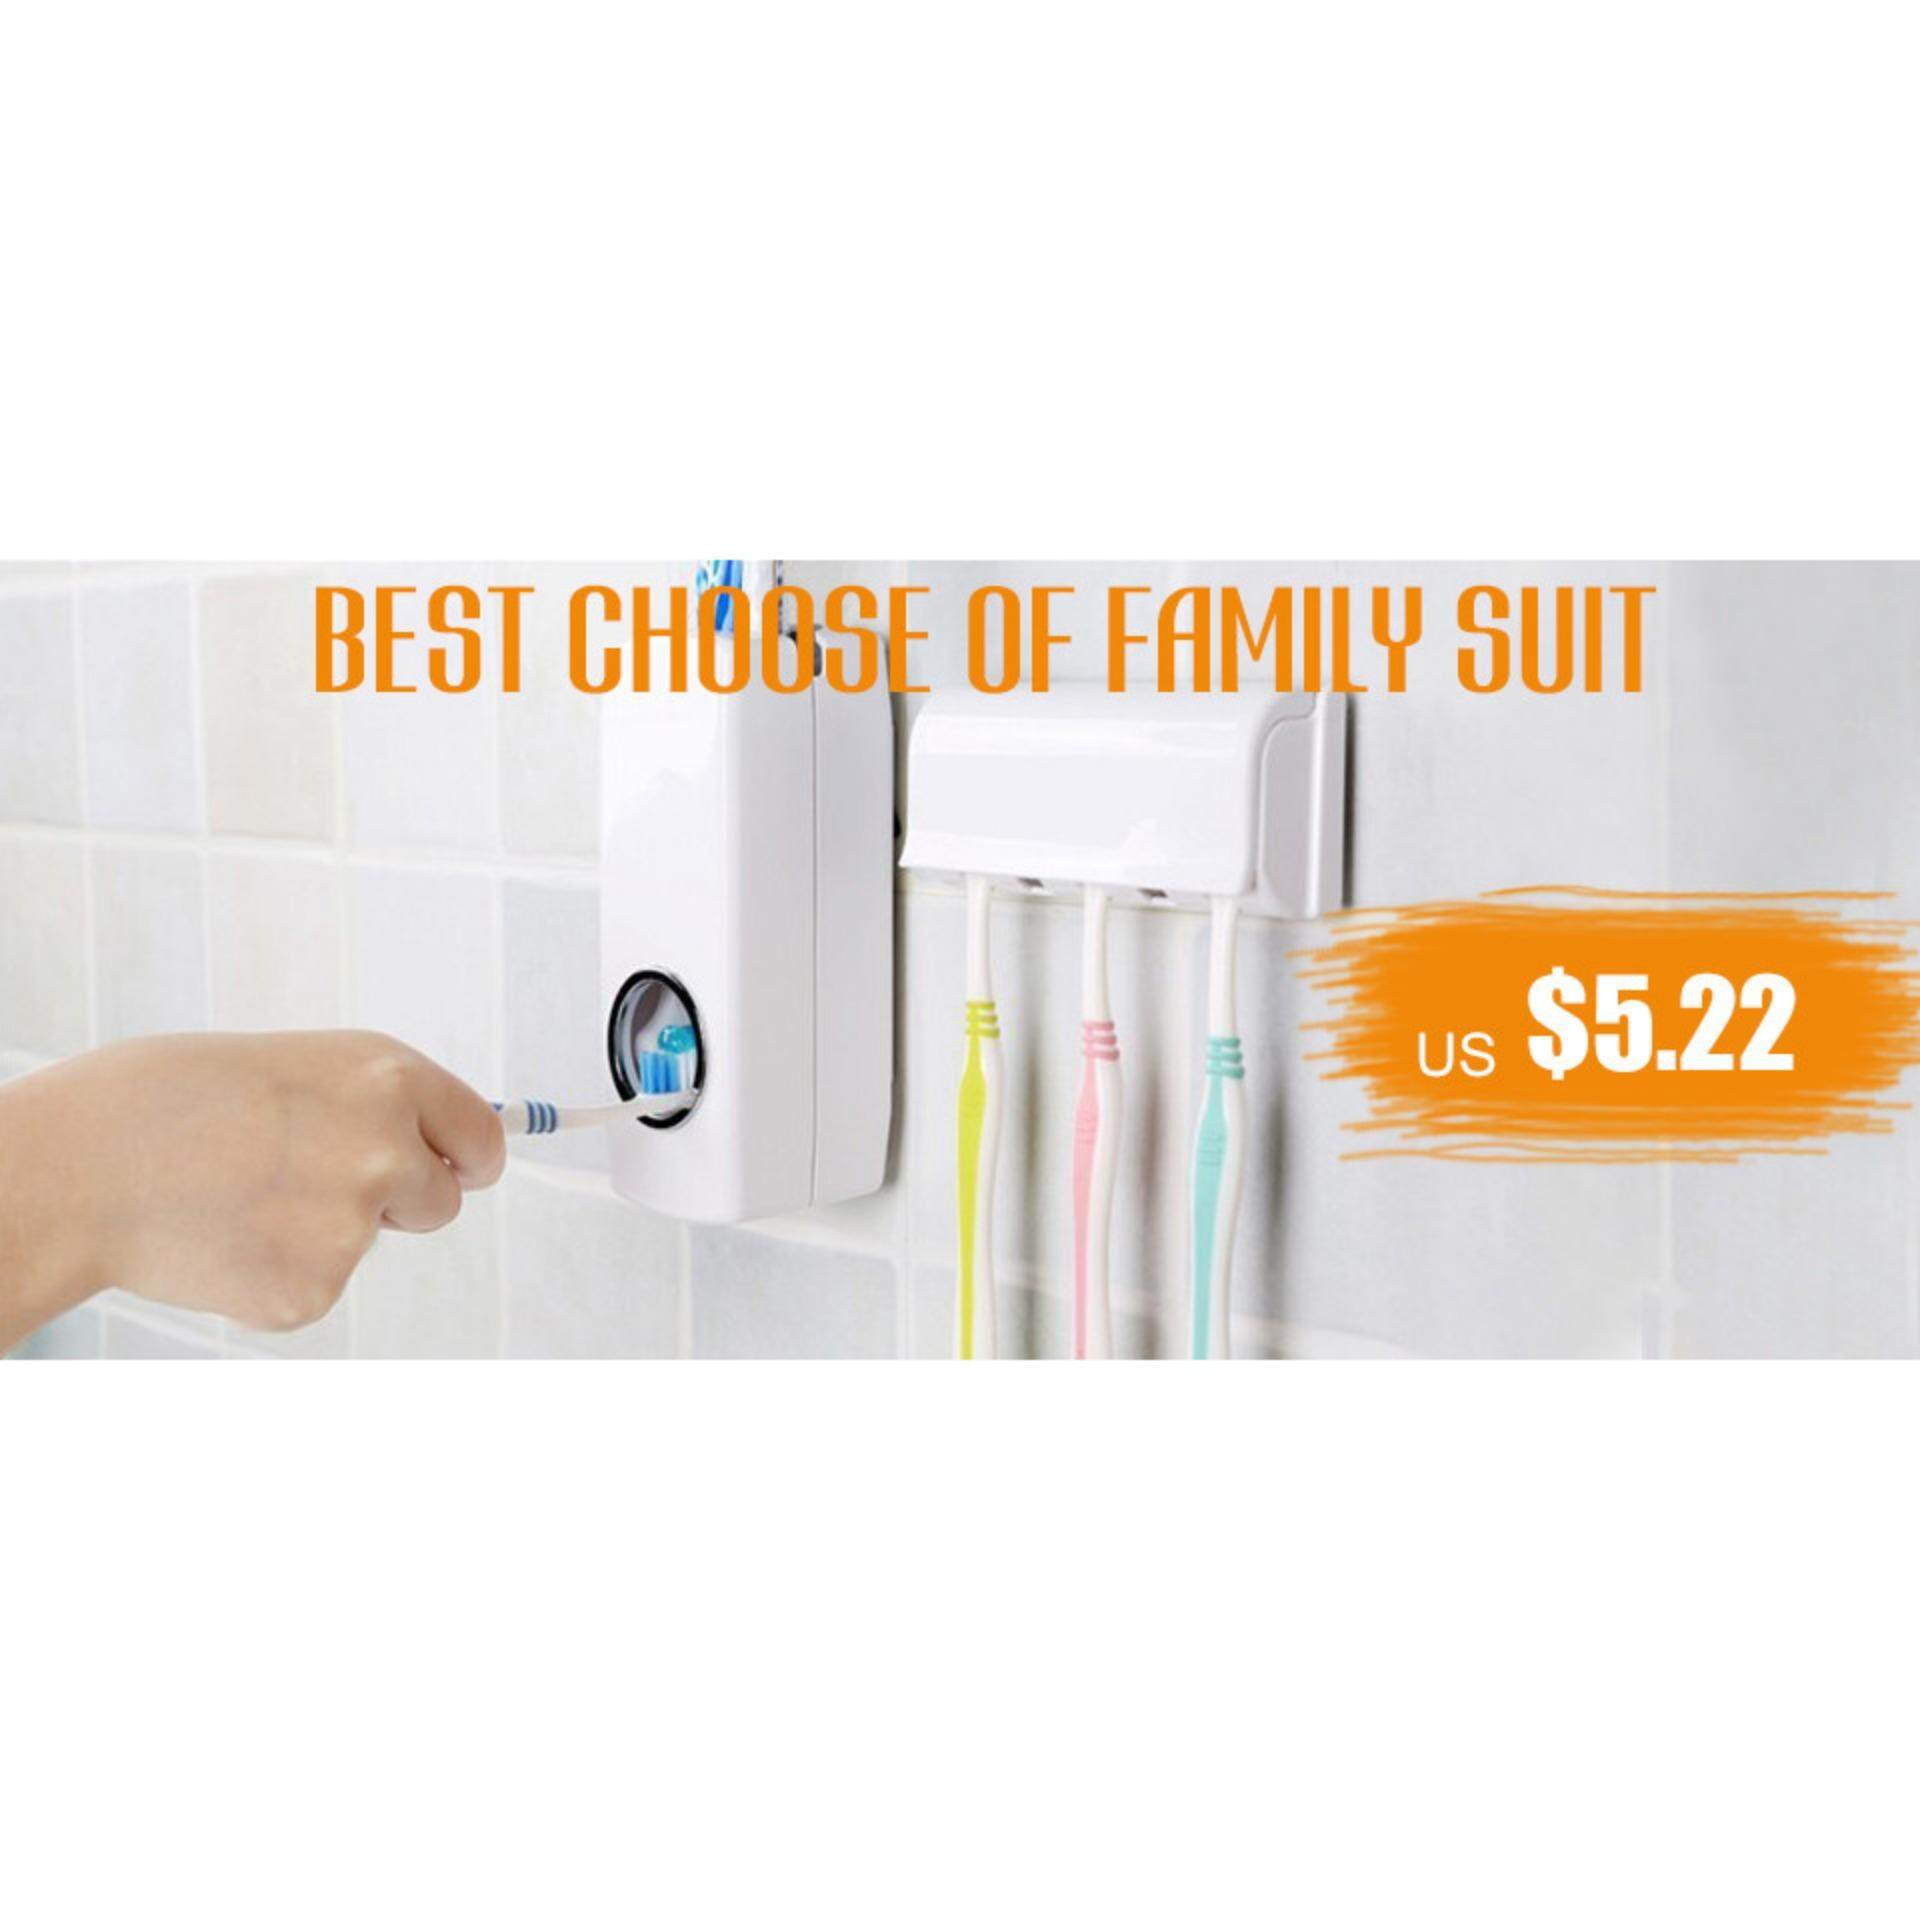 Kelebihan Uniwood Toothbrush Wall Mount Stand Bathroom Tools White 360do Tooth Brush For Baby Detail Gambar Intl Terbaru